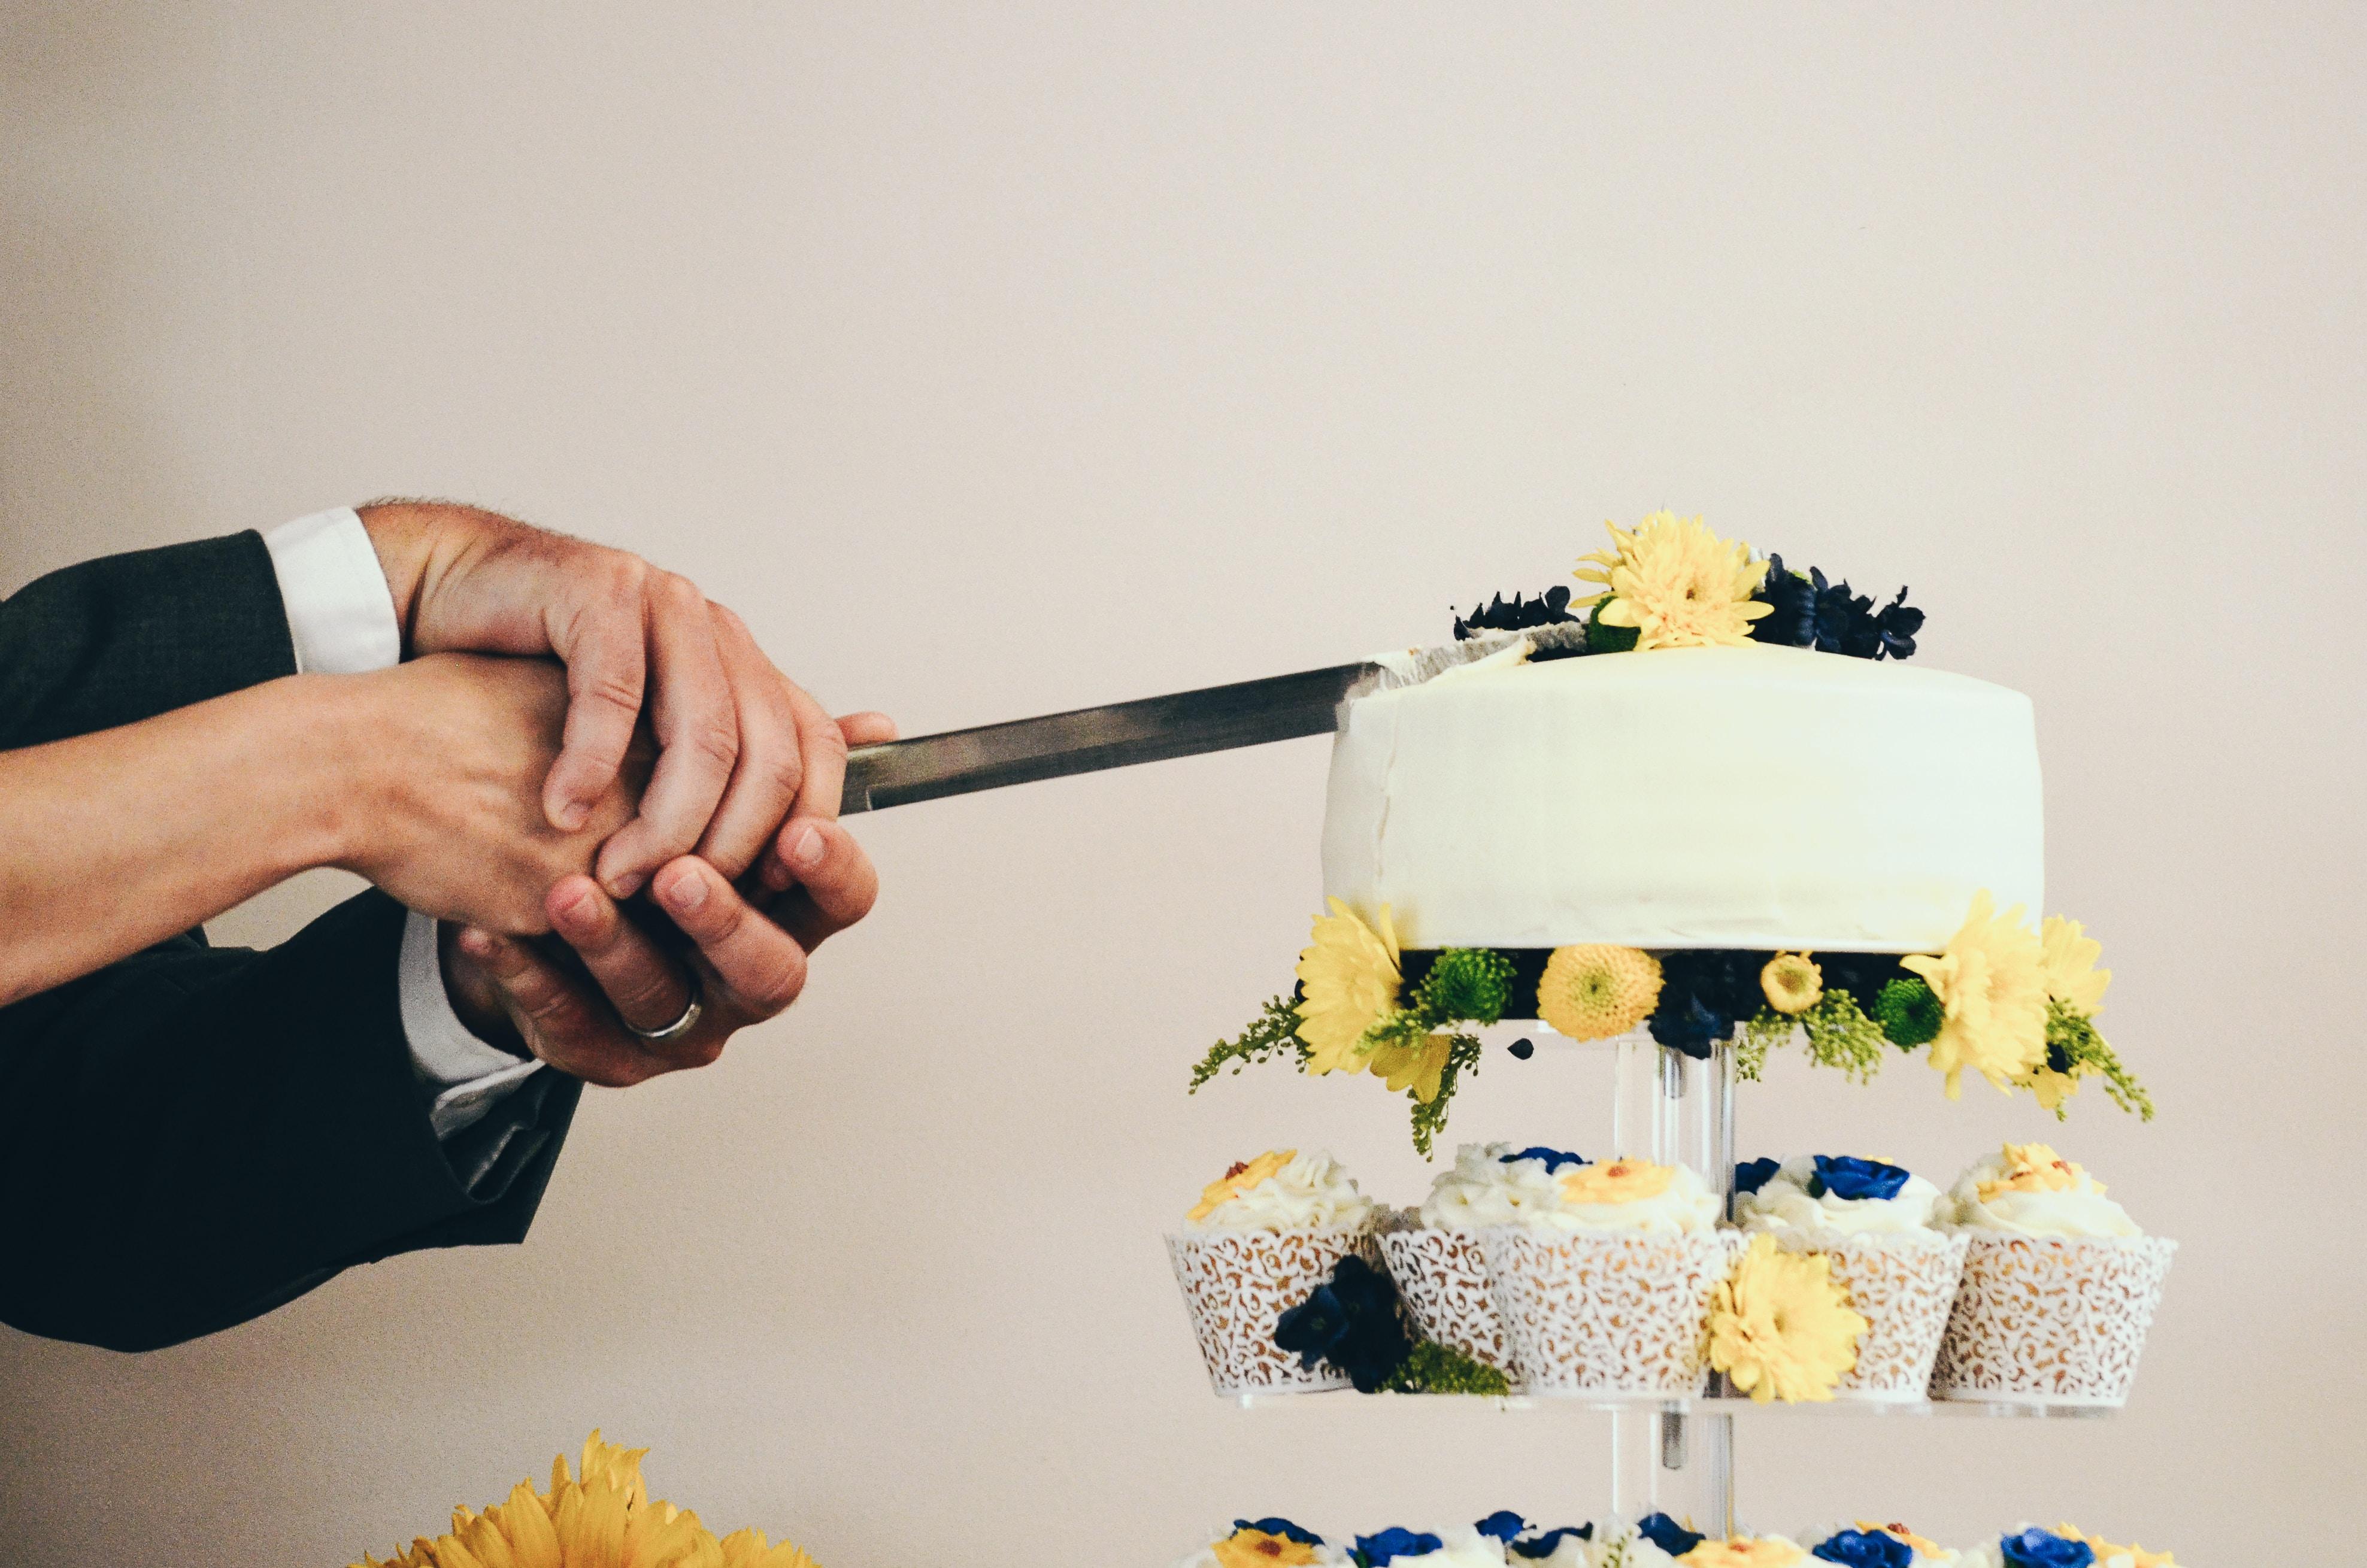 couple both holding knife slicing a cake on tray